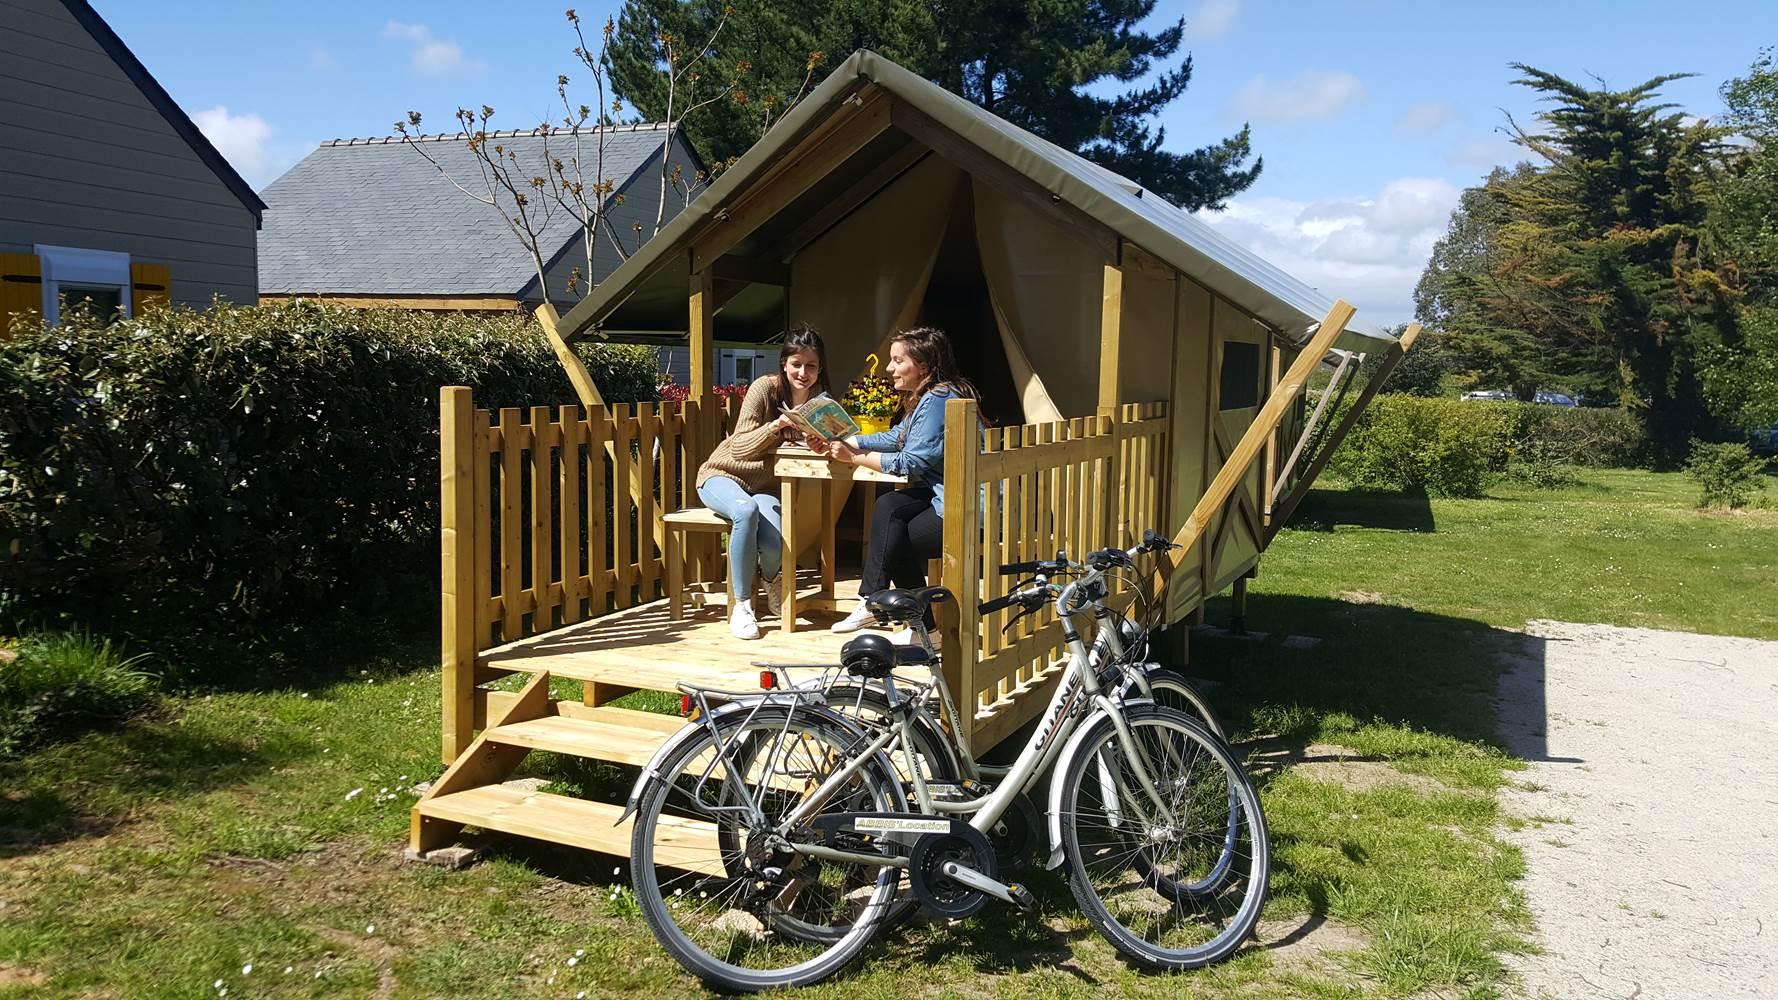 Tente Baroudeur Camping Le Tindio ©